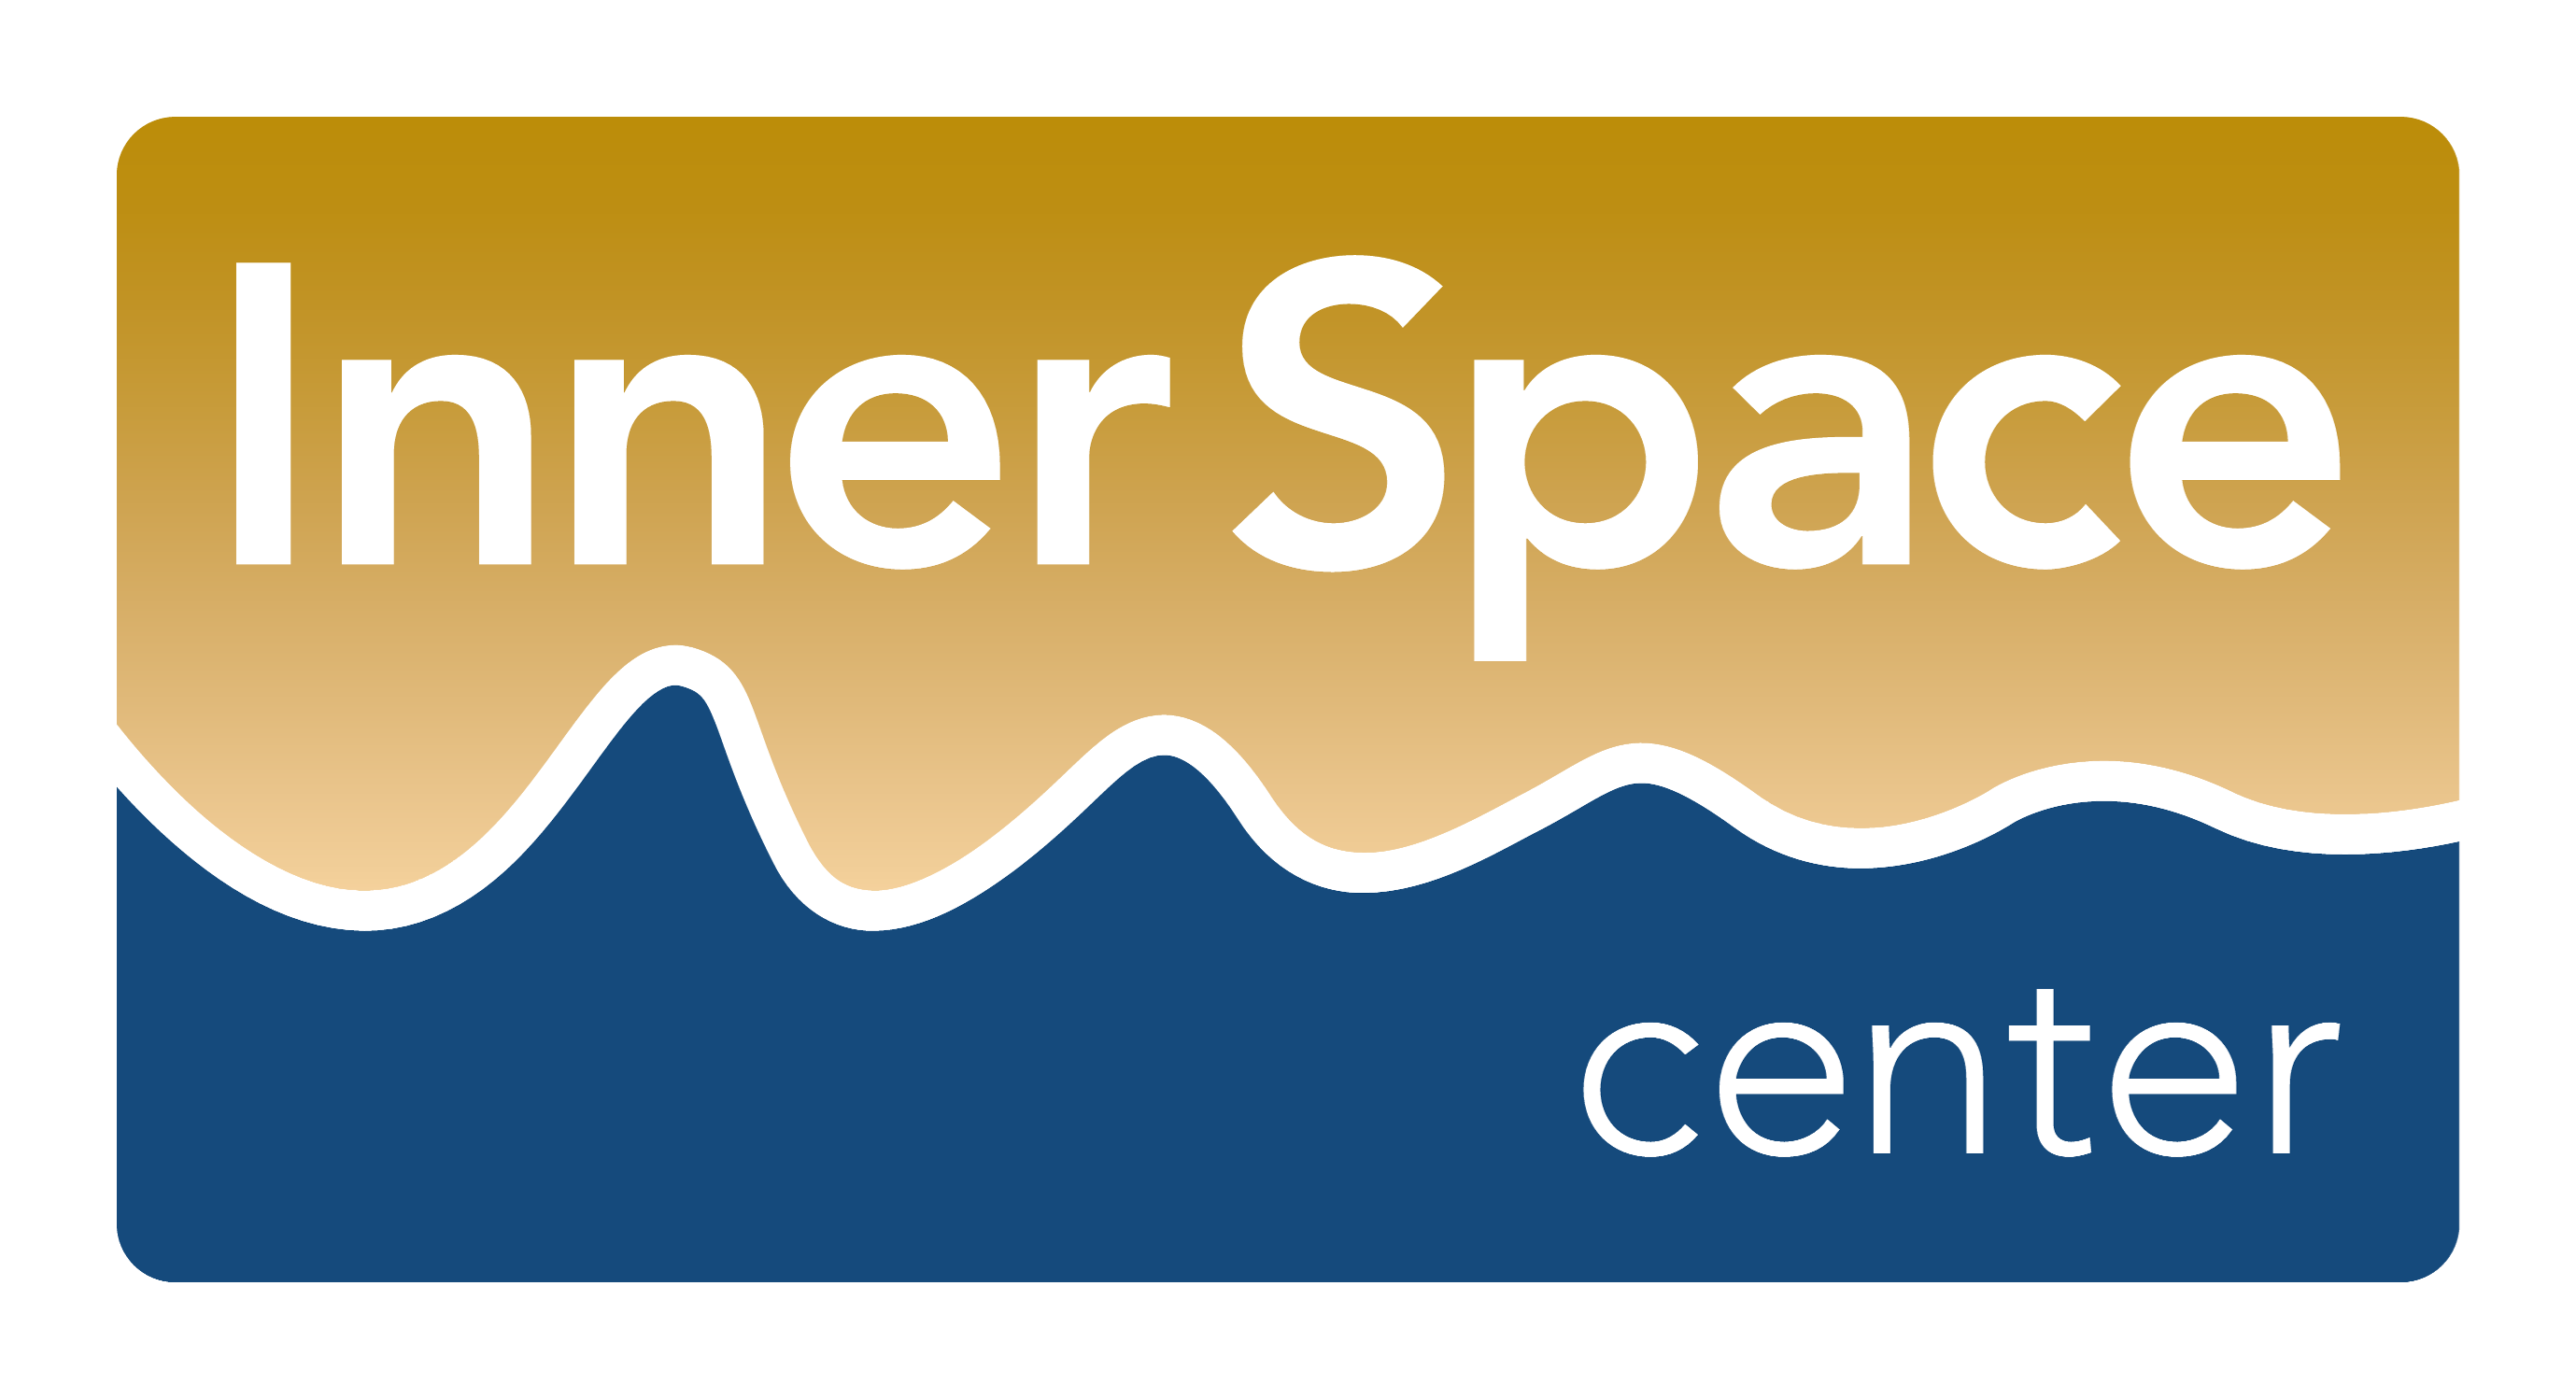 ISC-logo-noborder-quarter